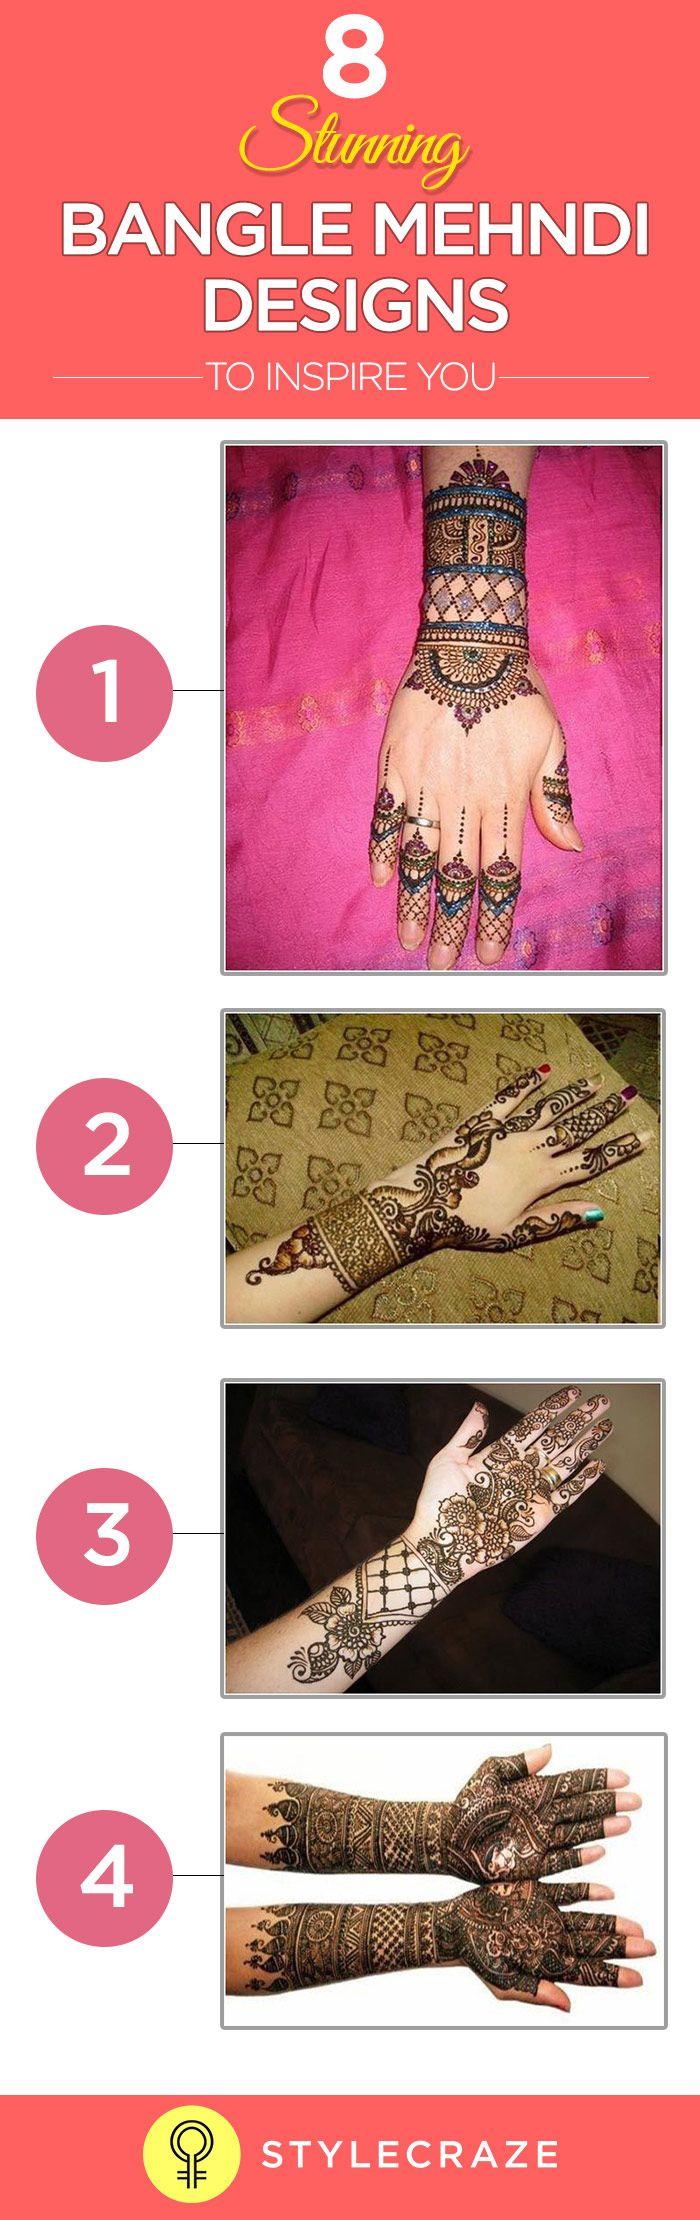 Pin mehndi and bangles display pics awesome dp wallpaper on pinterest - 8 Stunning Bangle Mehndi Designs To Inspire You